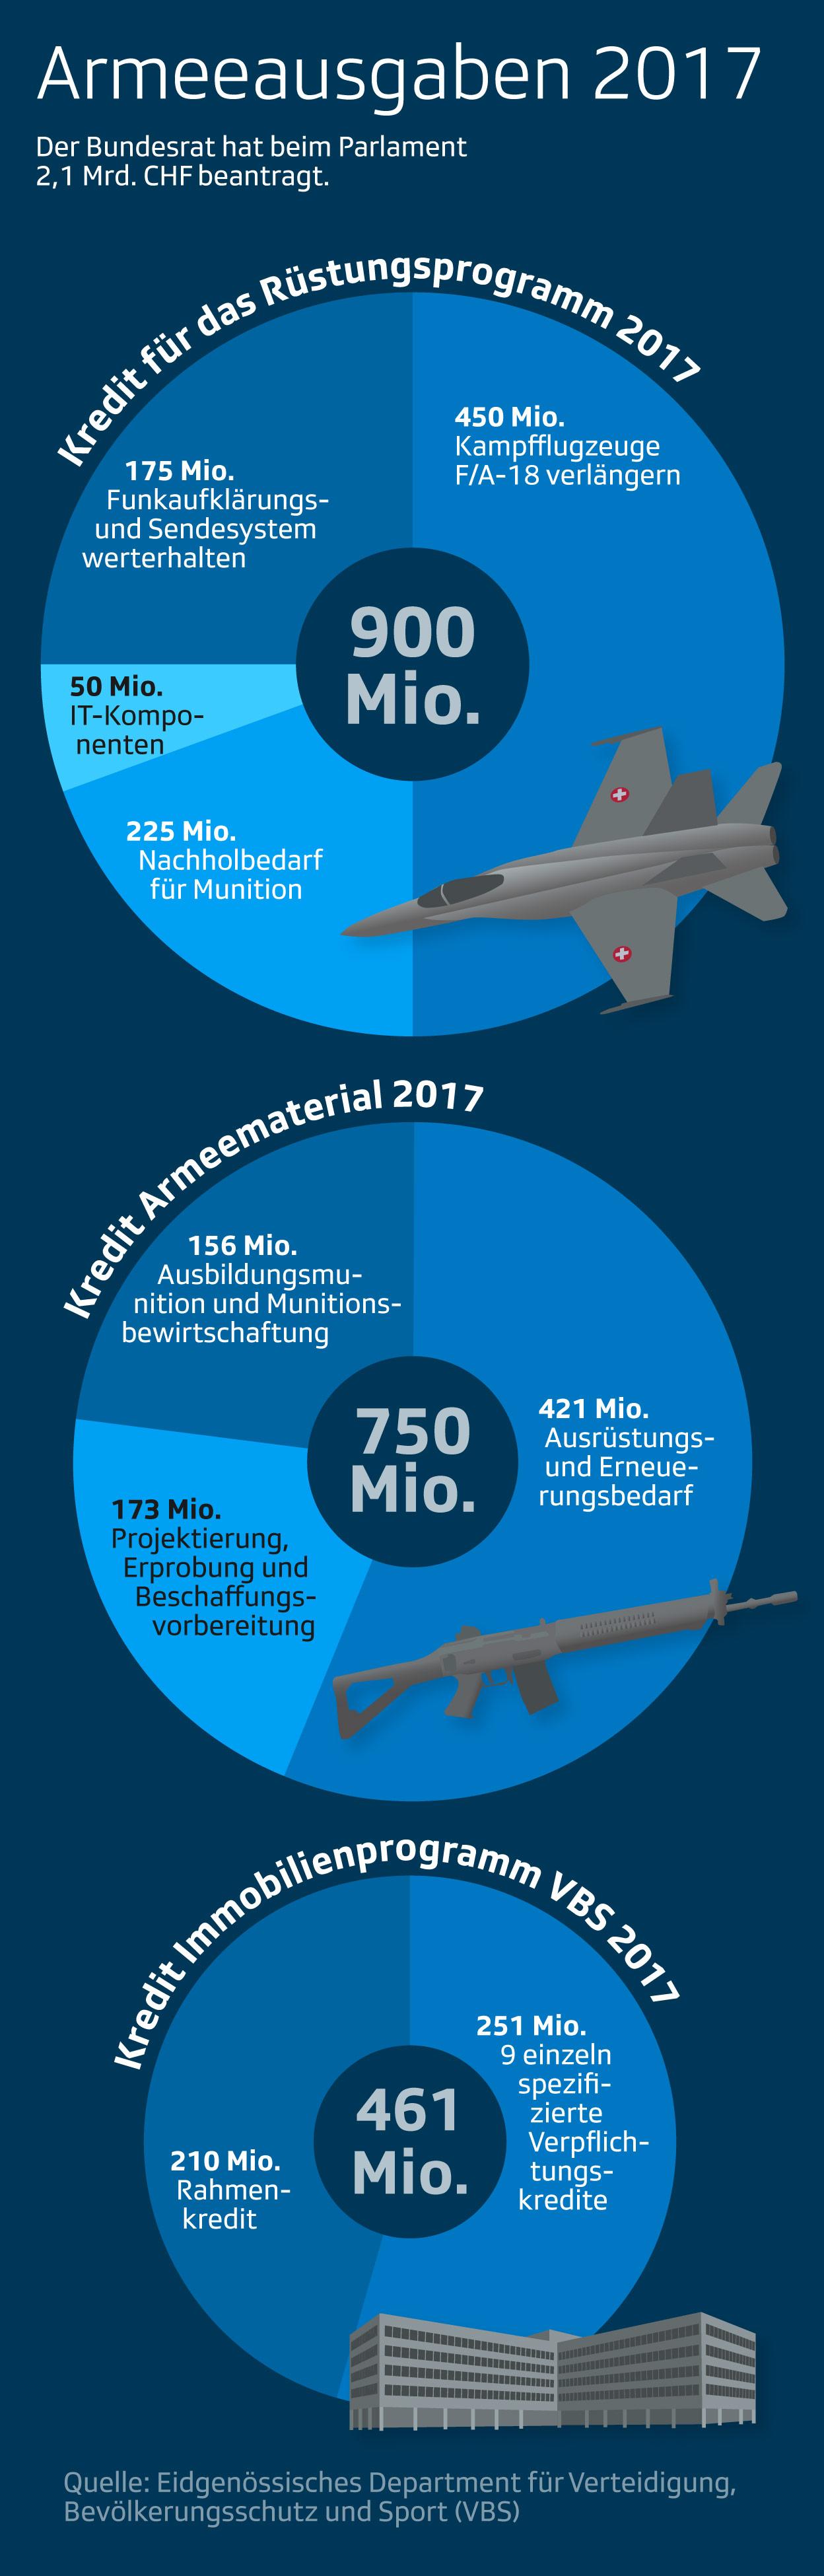 Armeeausgaben 2017